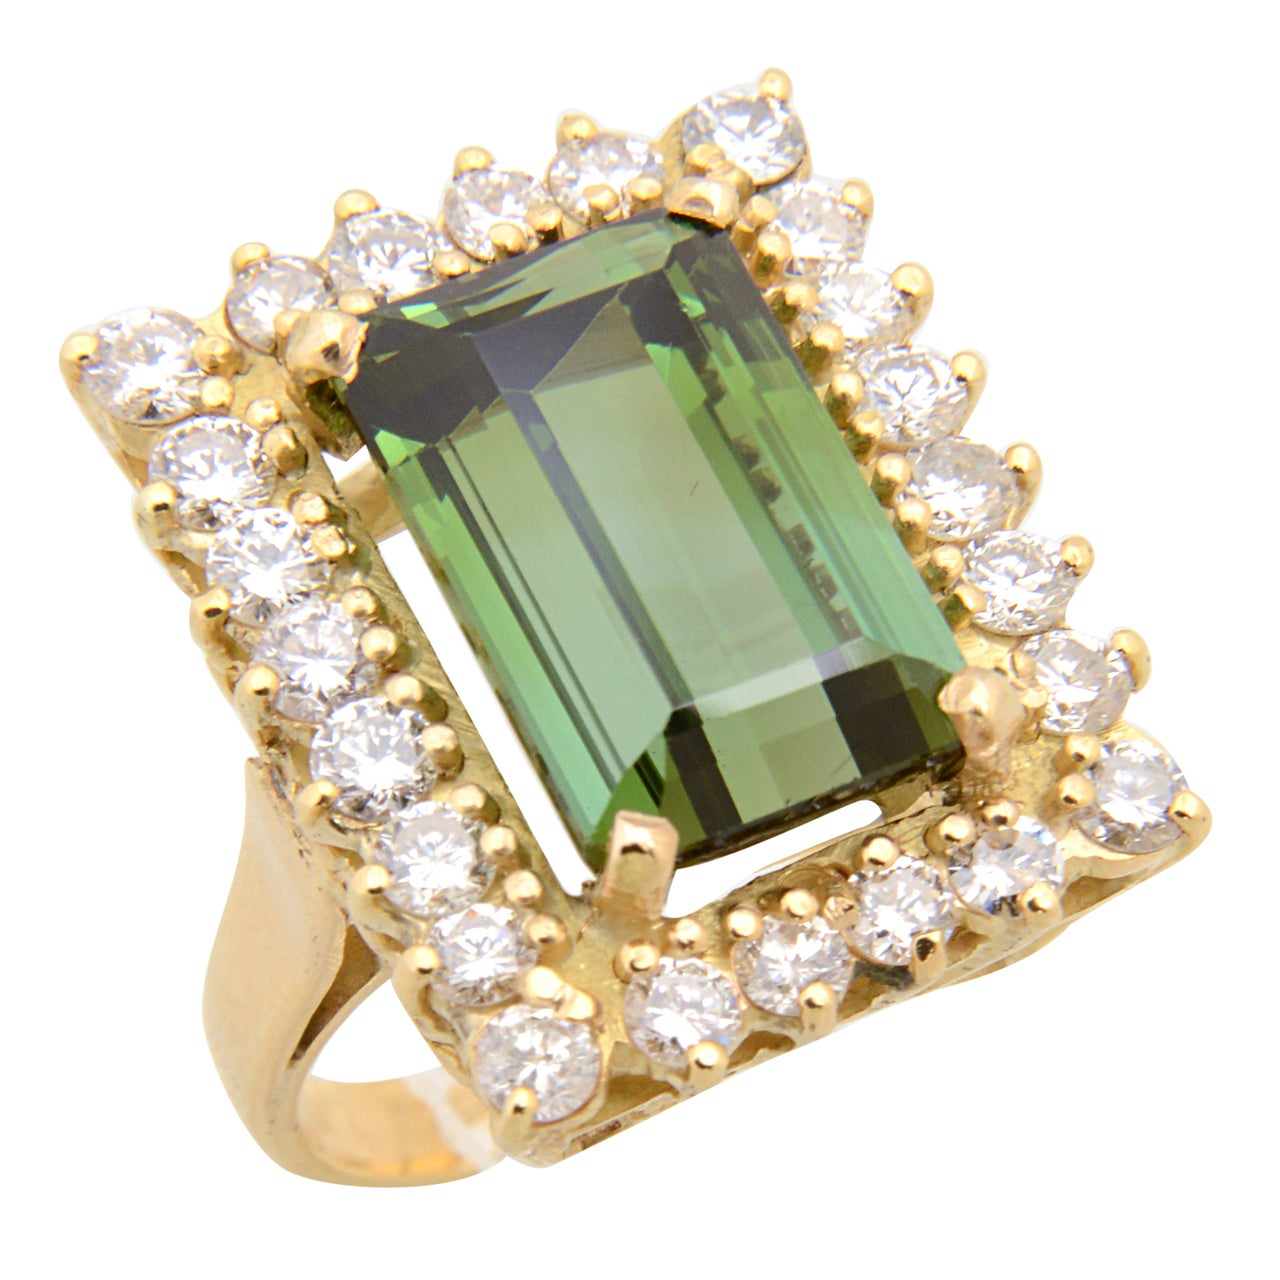 elegant green tourmaline diamond gold ring for sale at 1stdibs. Black Bedroom Furniture Sets. Home Design Ideas